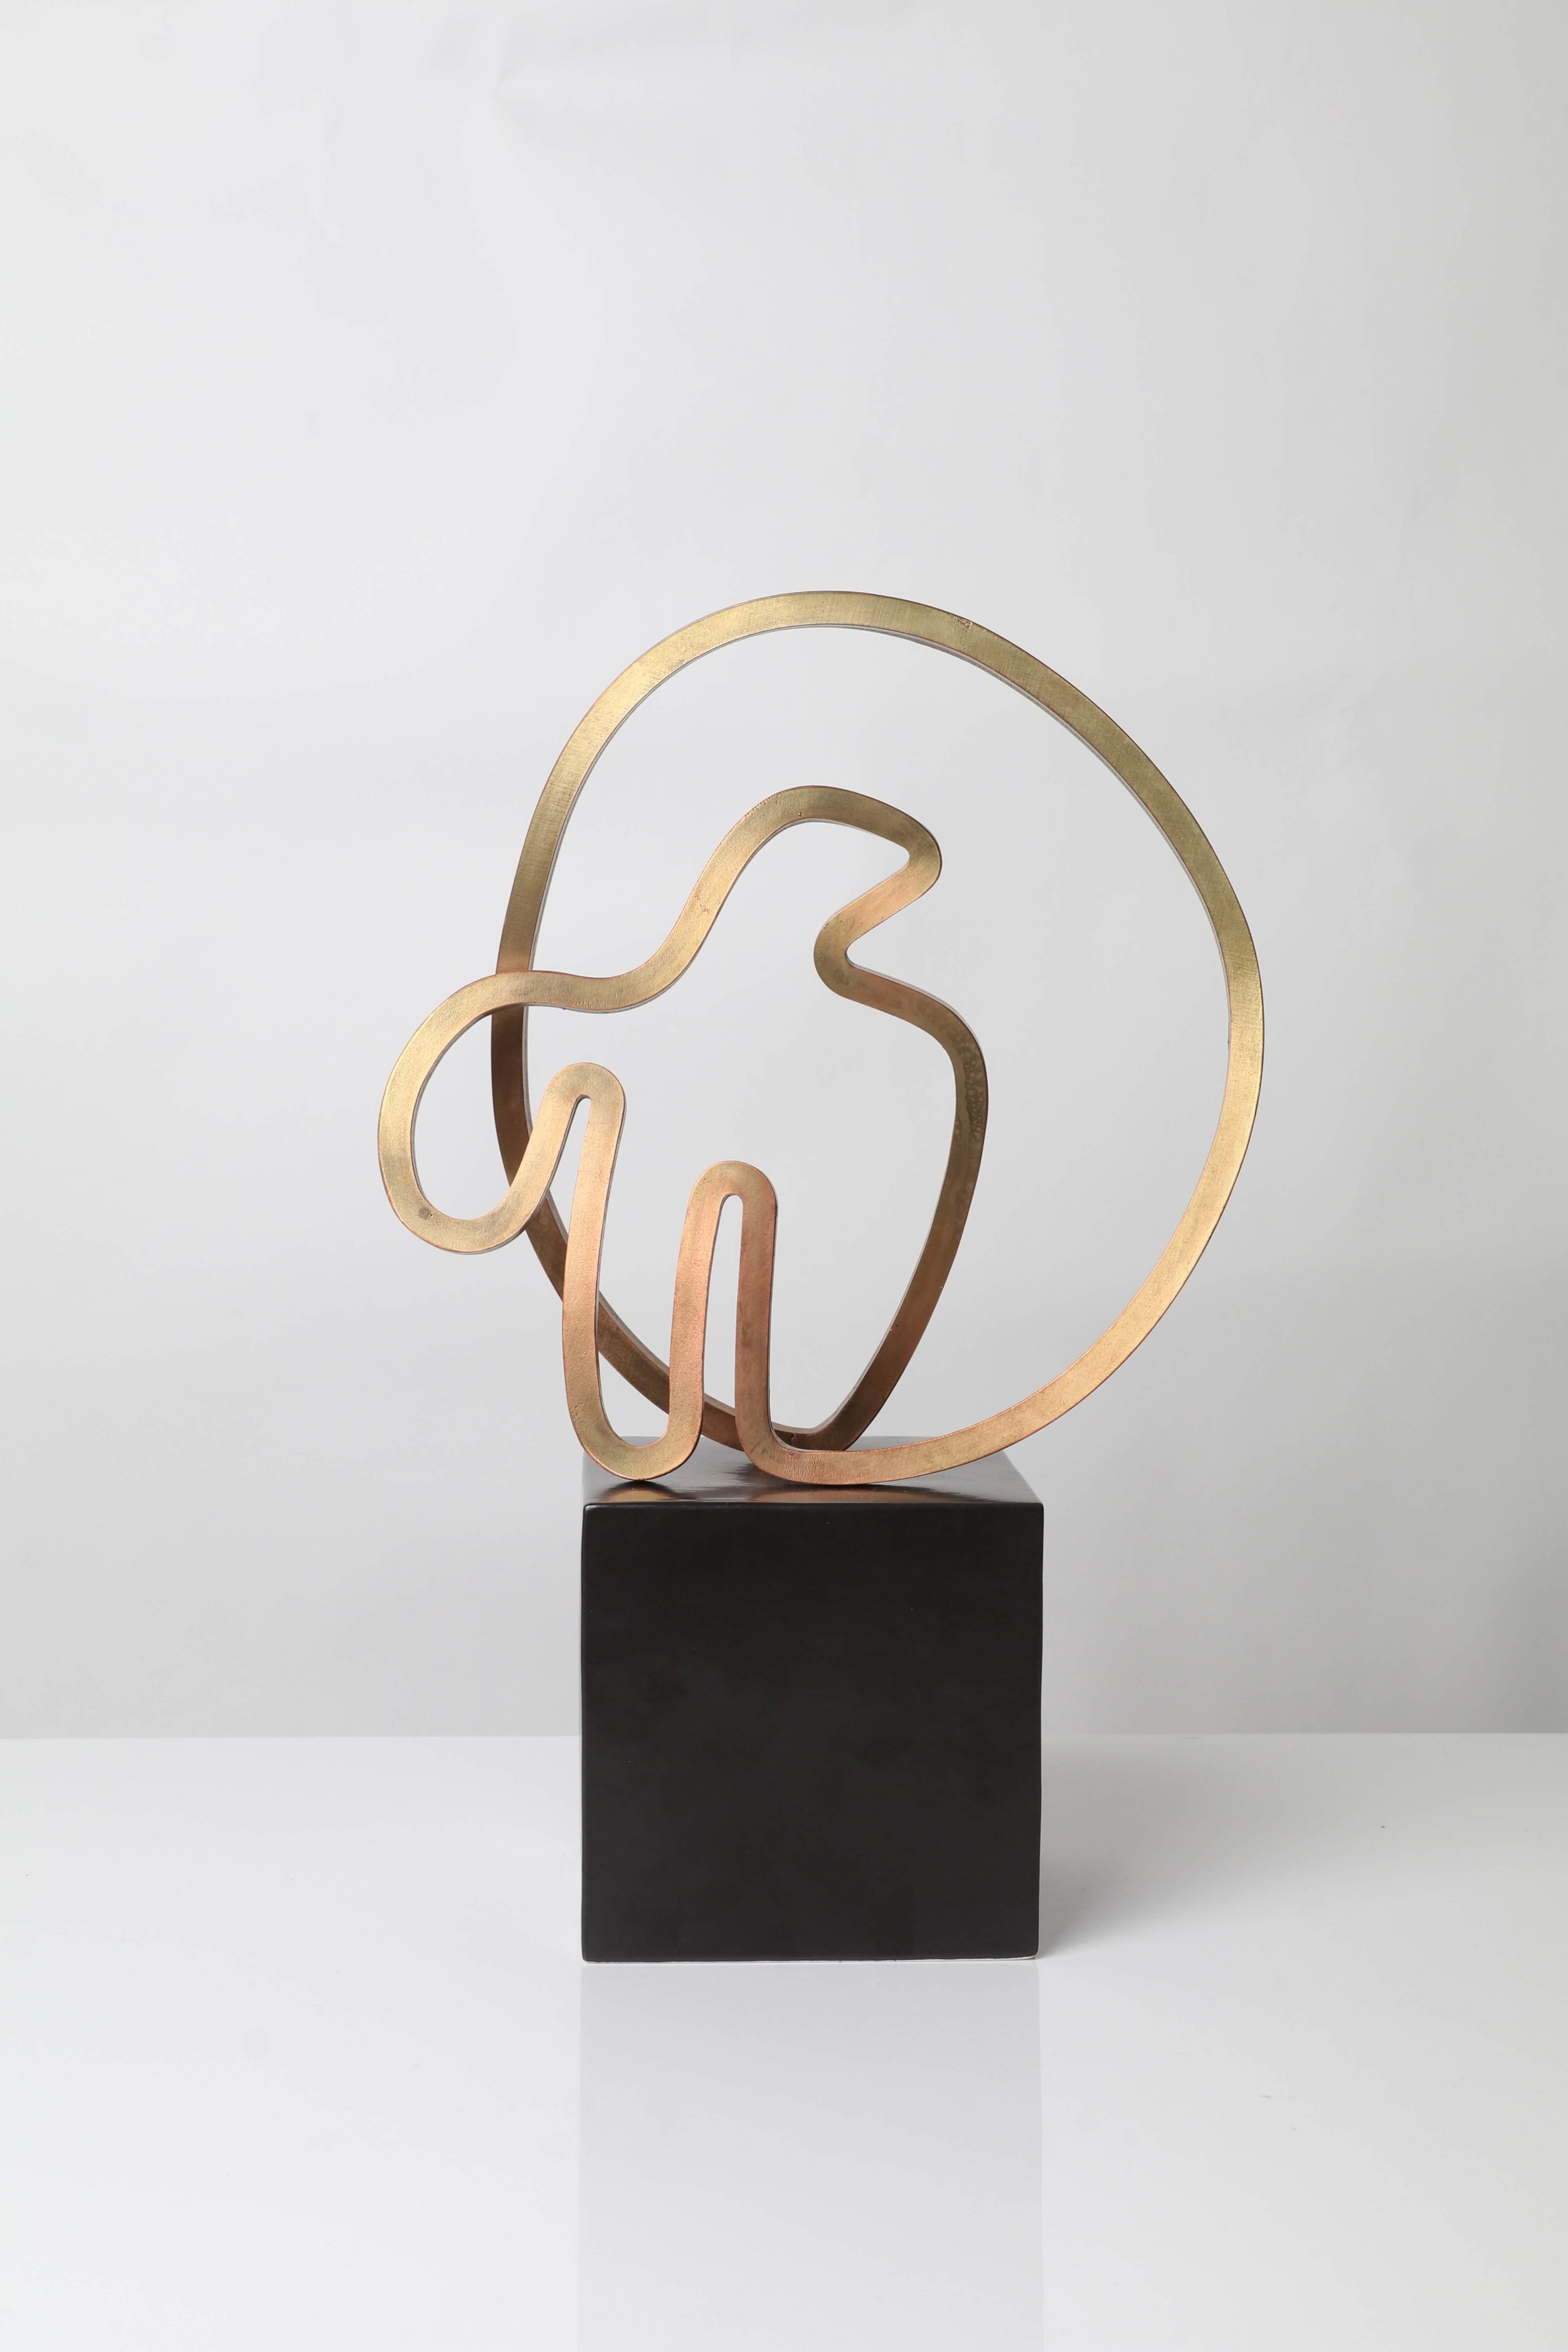 Gidon Bing 'Aegean Bird' Brass Sculpture on Ceramic Plinth